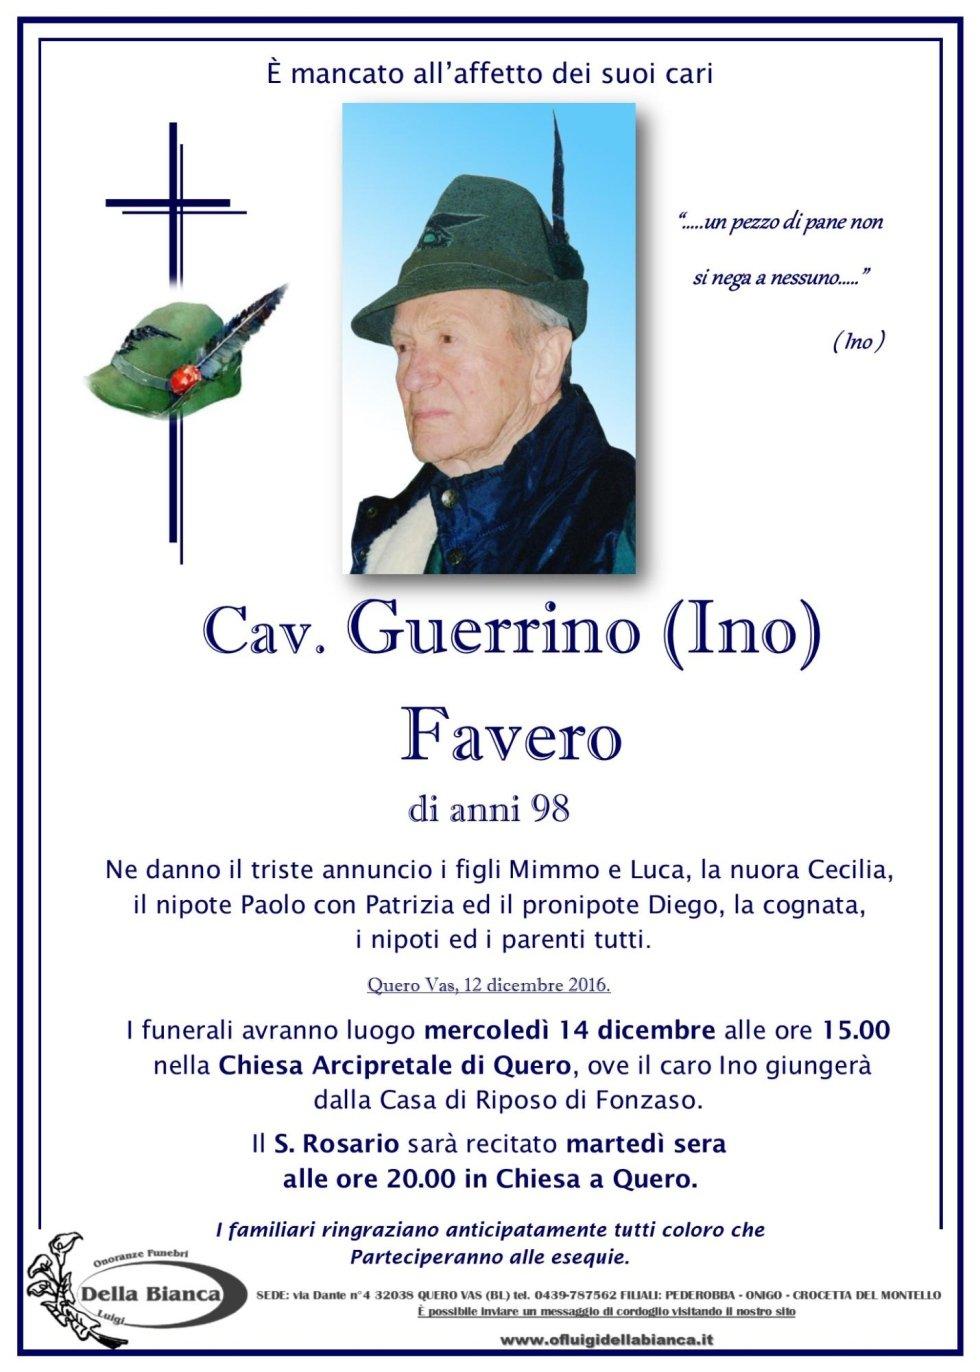 Guerrino Favero